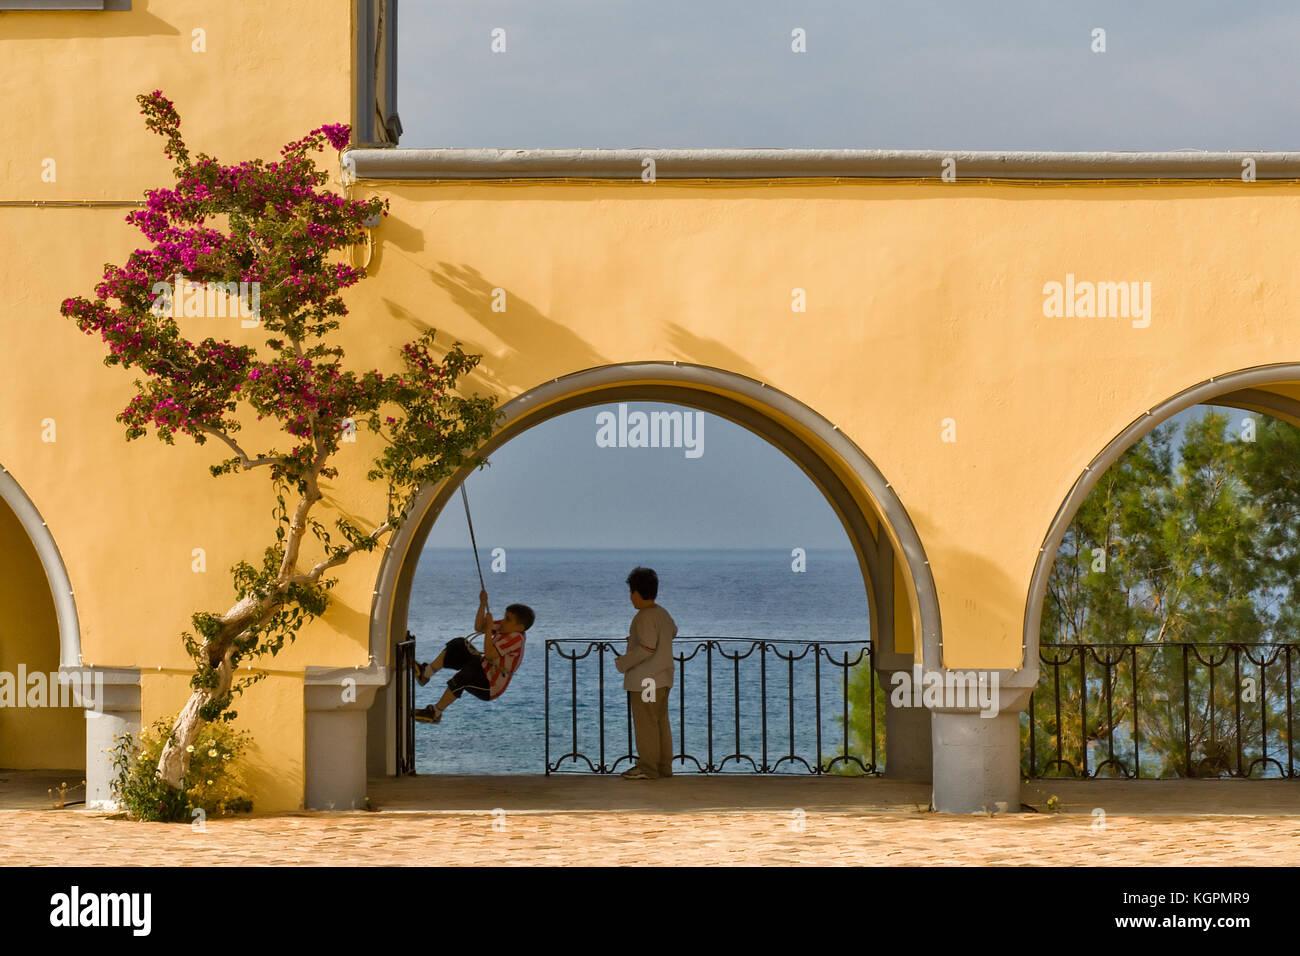 Greece, Aegean Islands, Karpathos island, City hall playground in Pigadia Stock Photo